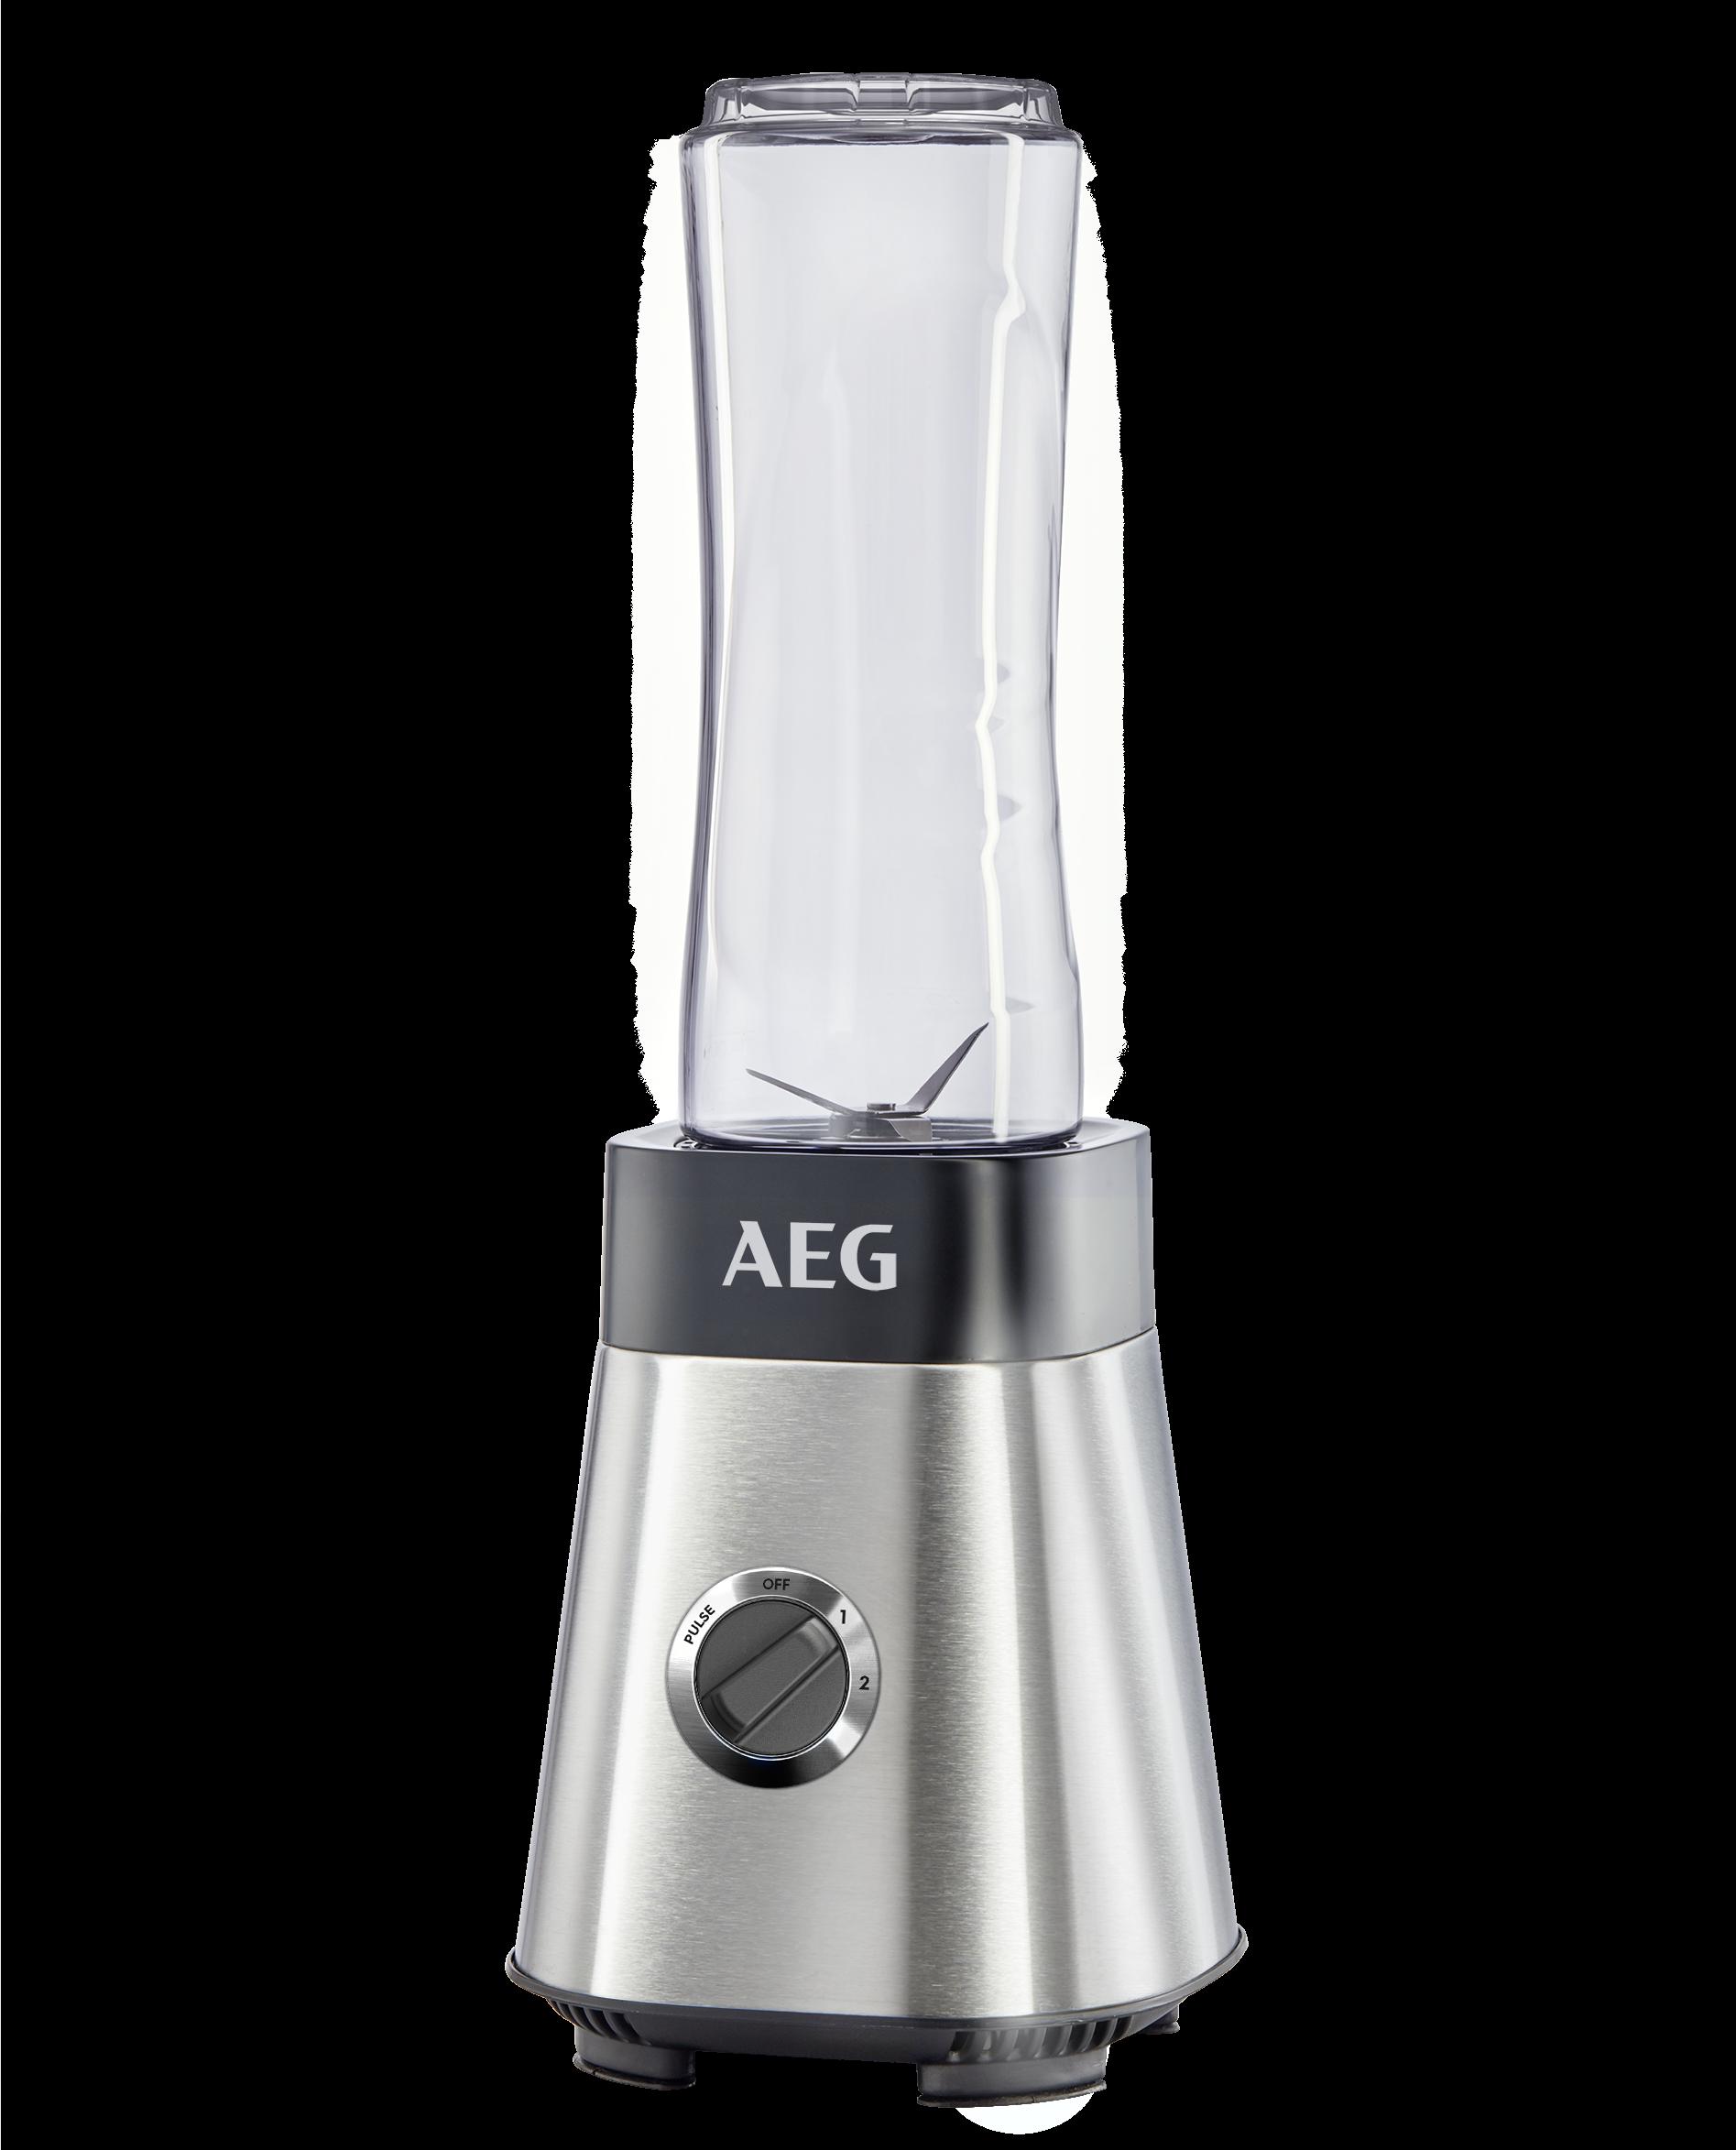 AEG PerfectMix Mini Mixer SB2900